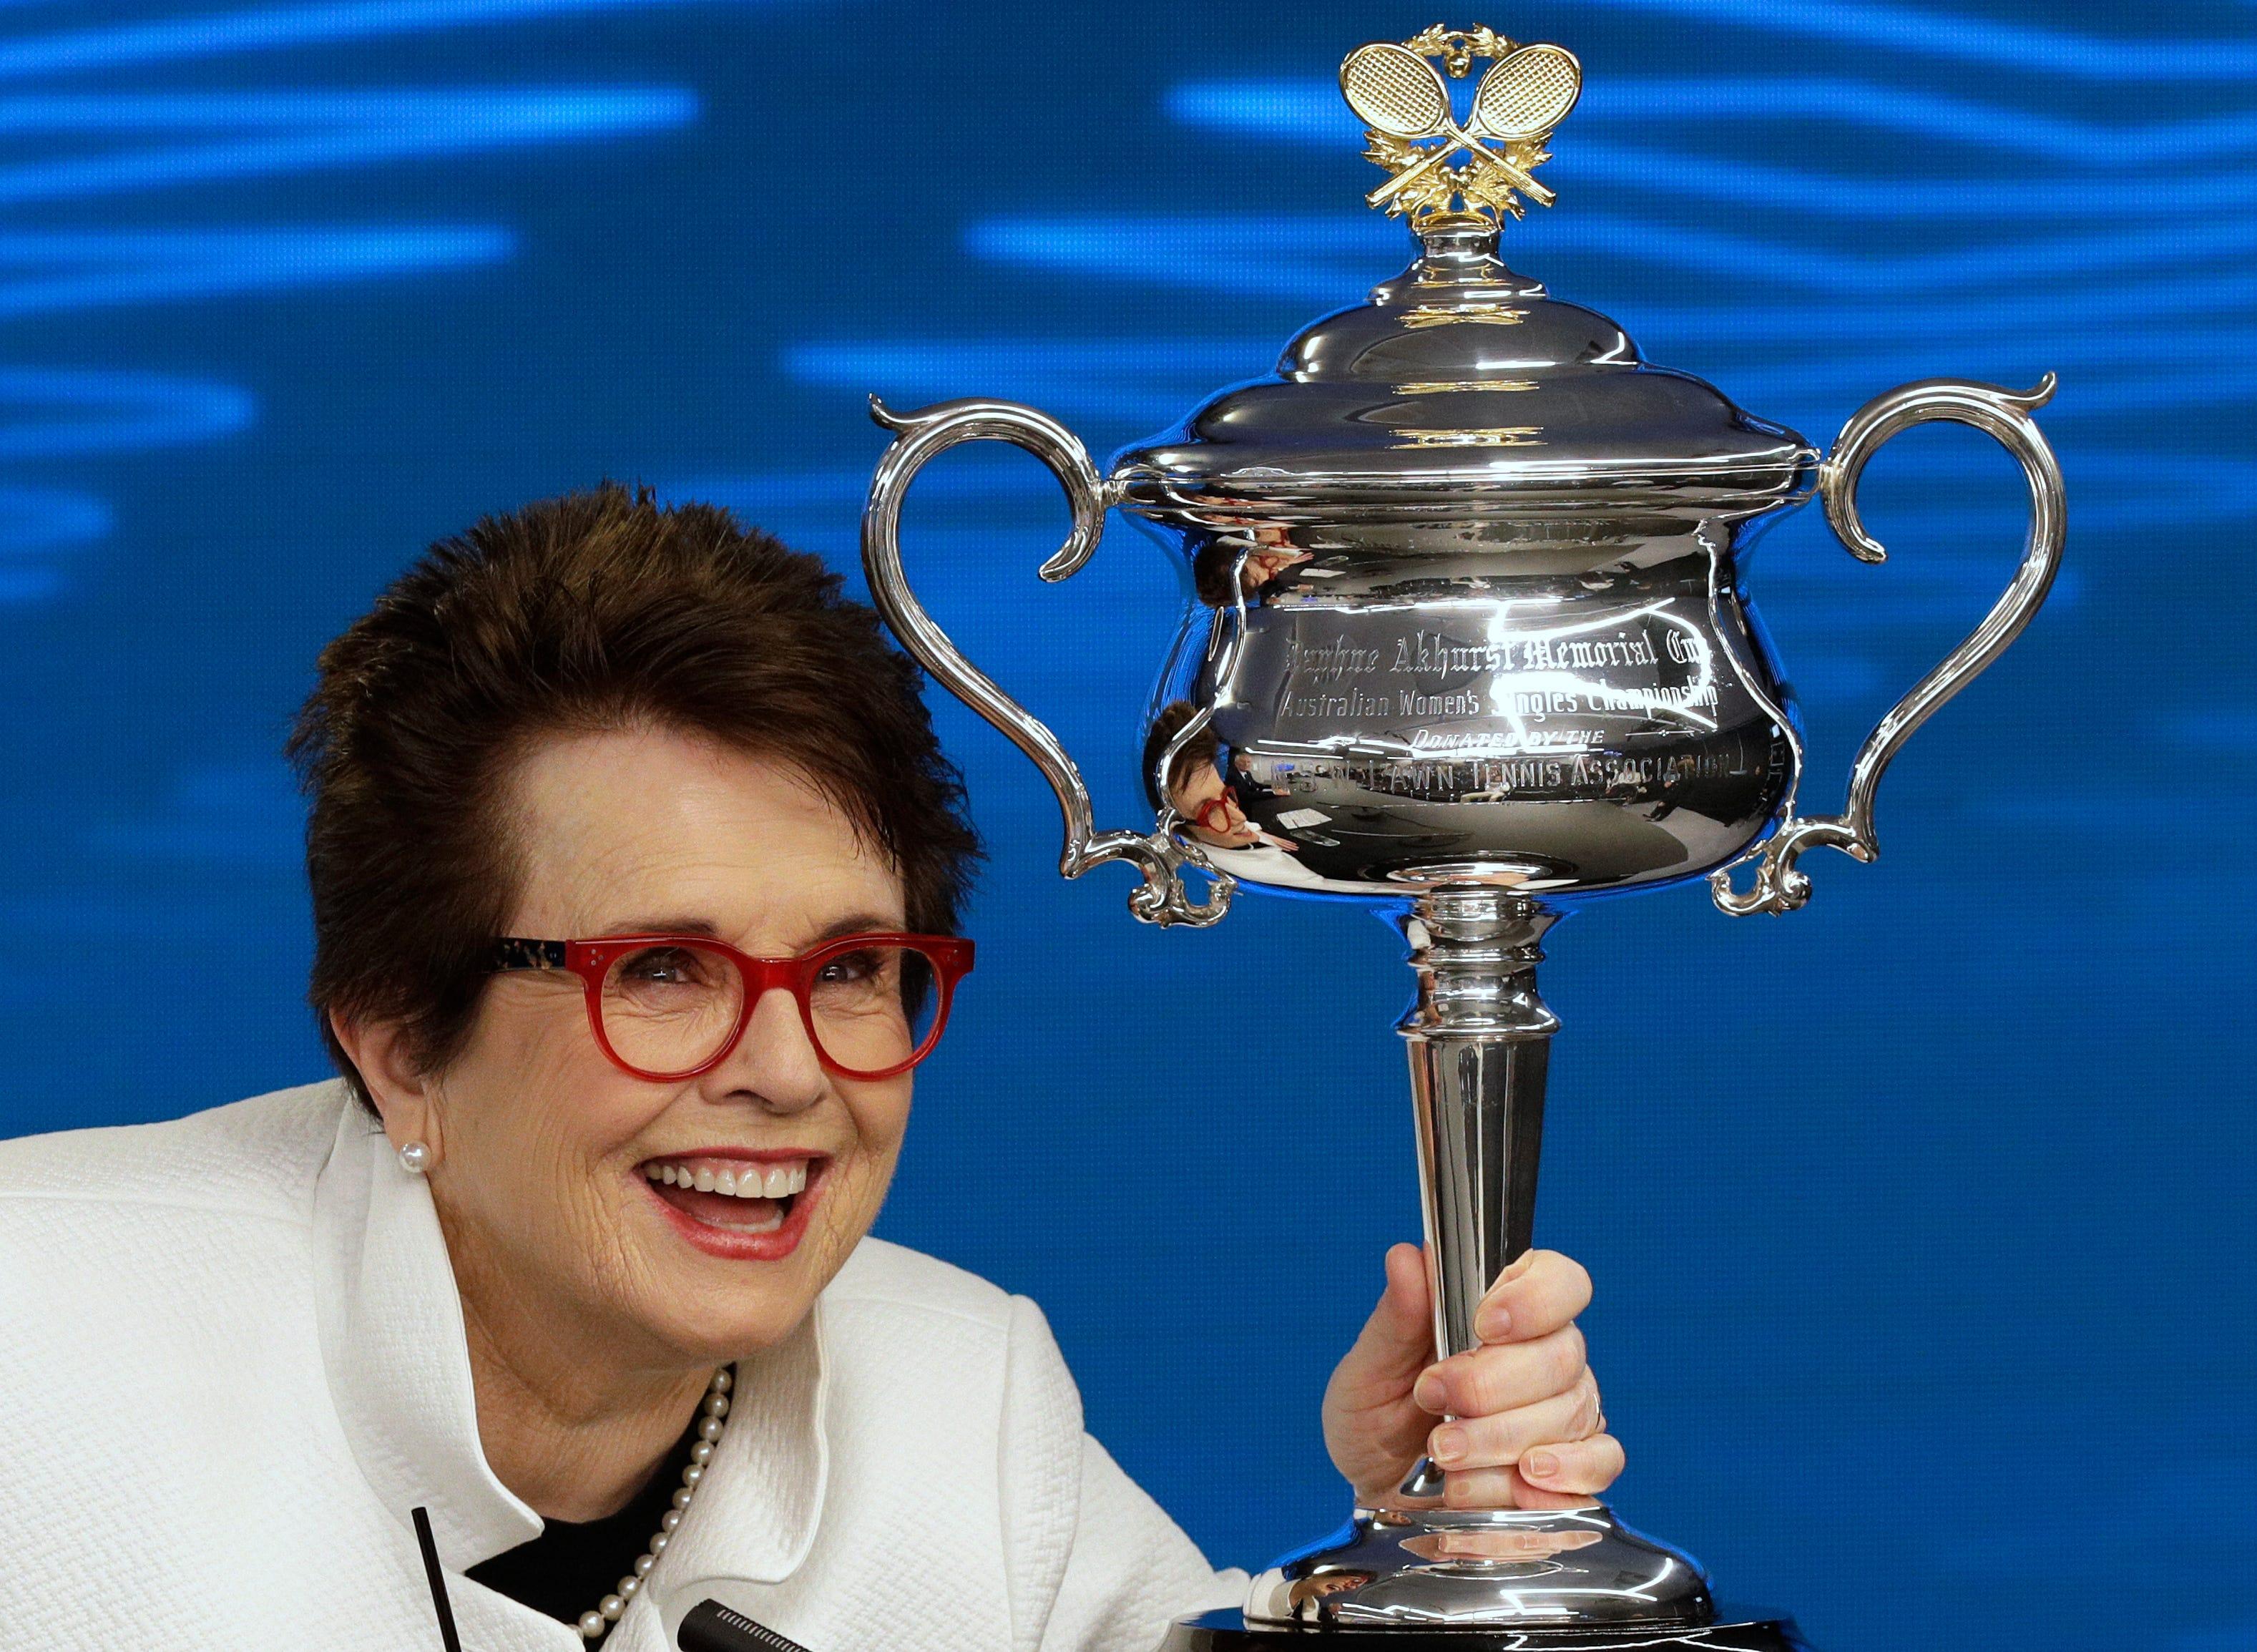 Billie Jean King 12 Grand Slam singles titles Billie Jean King 12 Grand Slam singles titles new picture